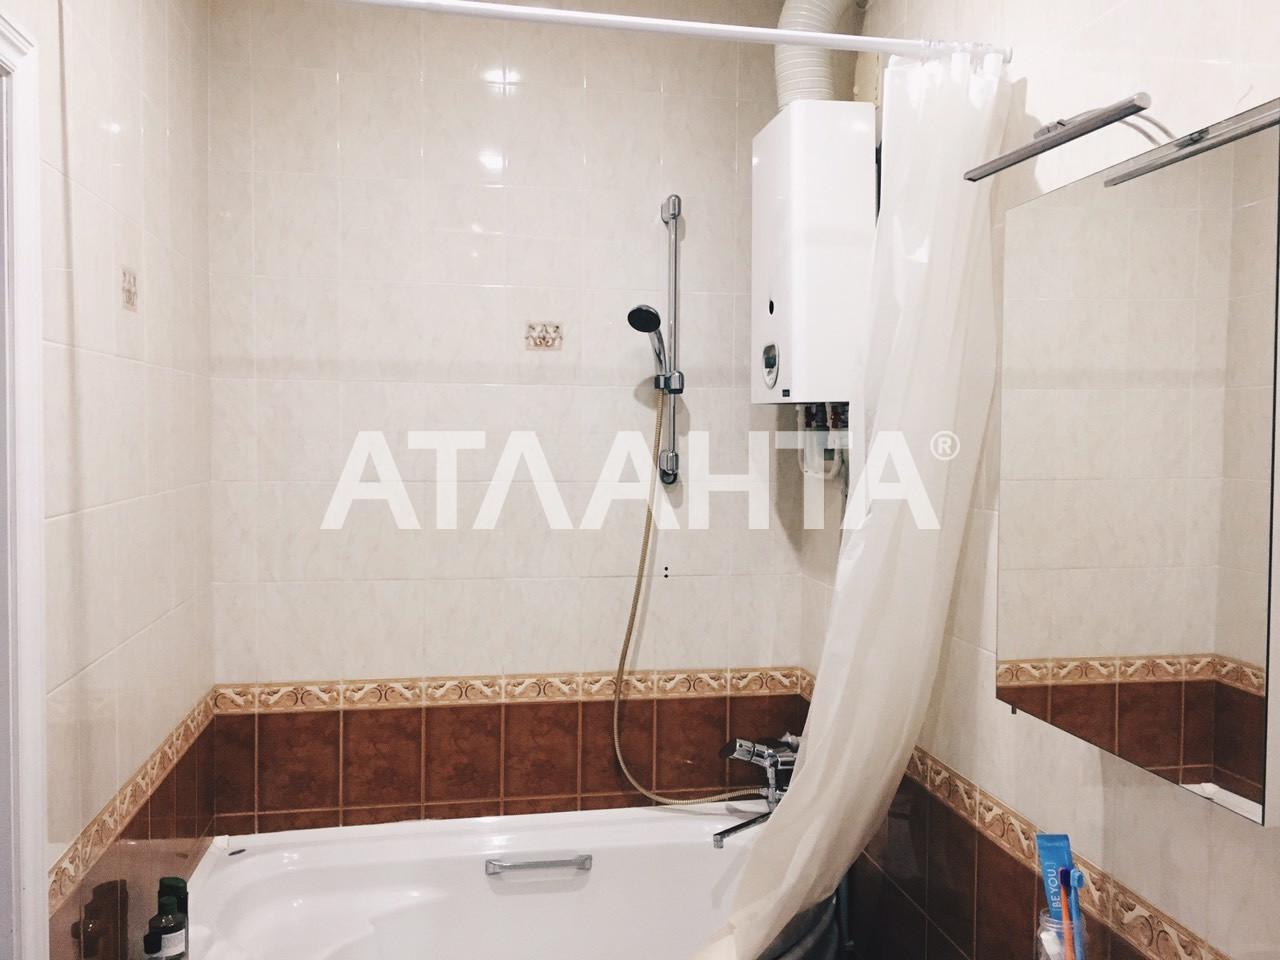 Продается 2-комнатная Квартира на ул. Семинарская (Гамарника) — 75 000 у.е. (фото №9)